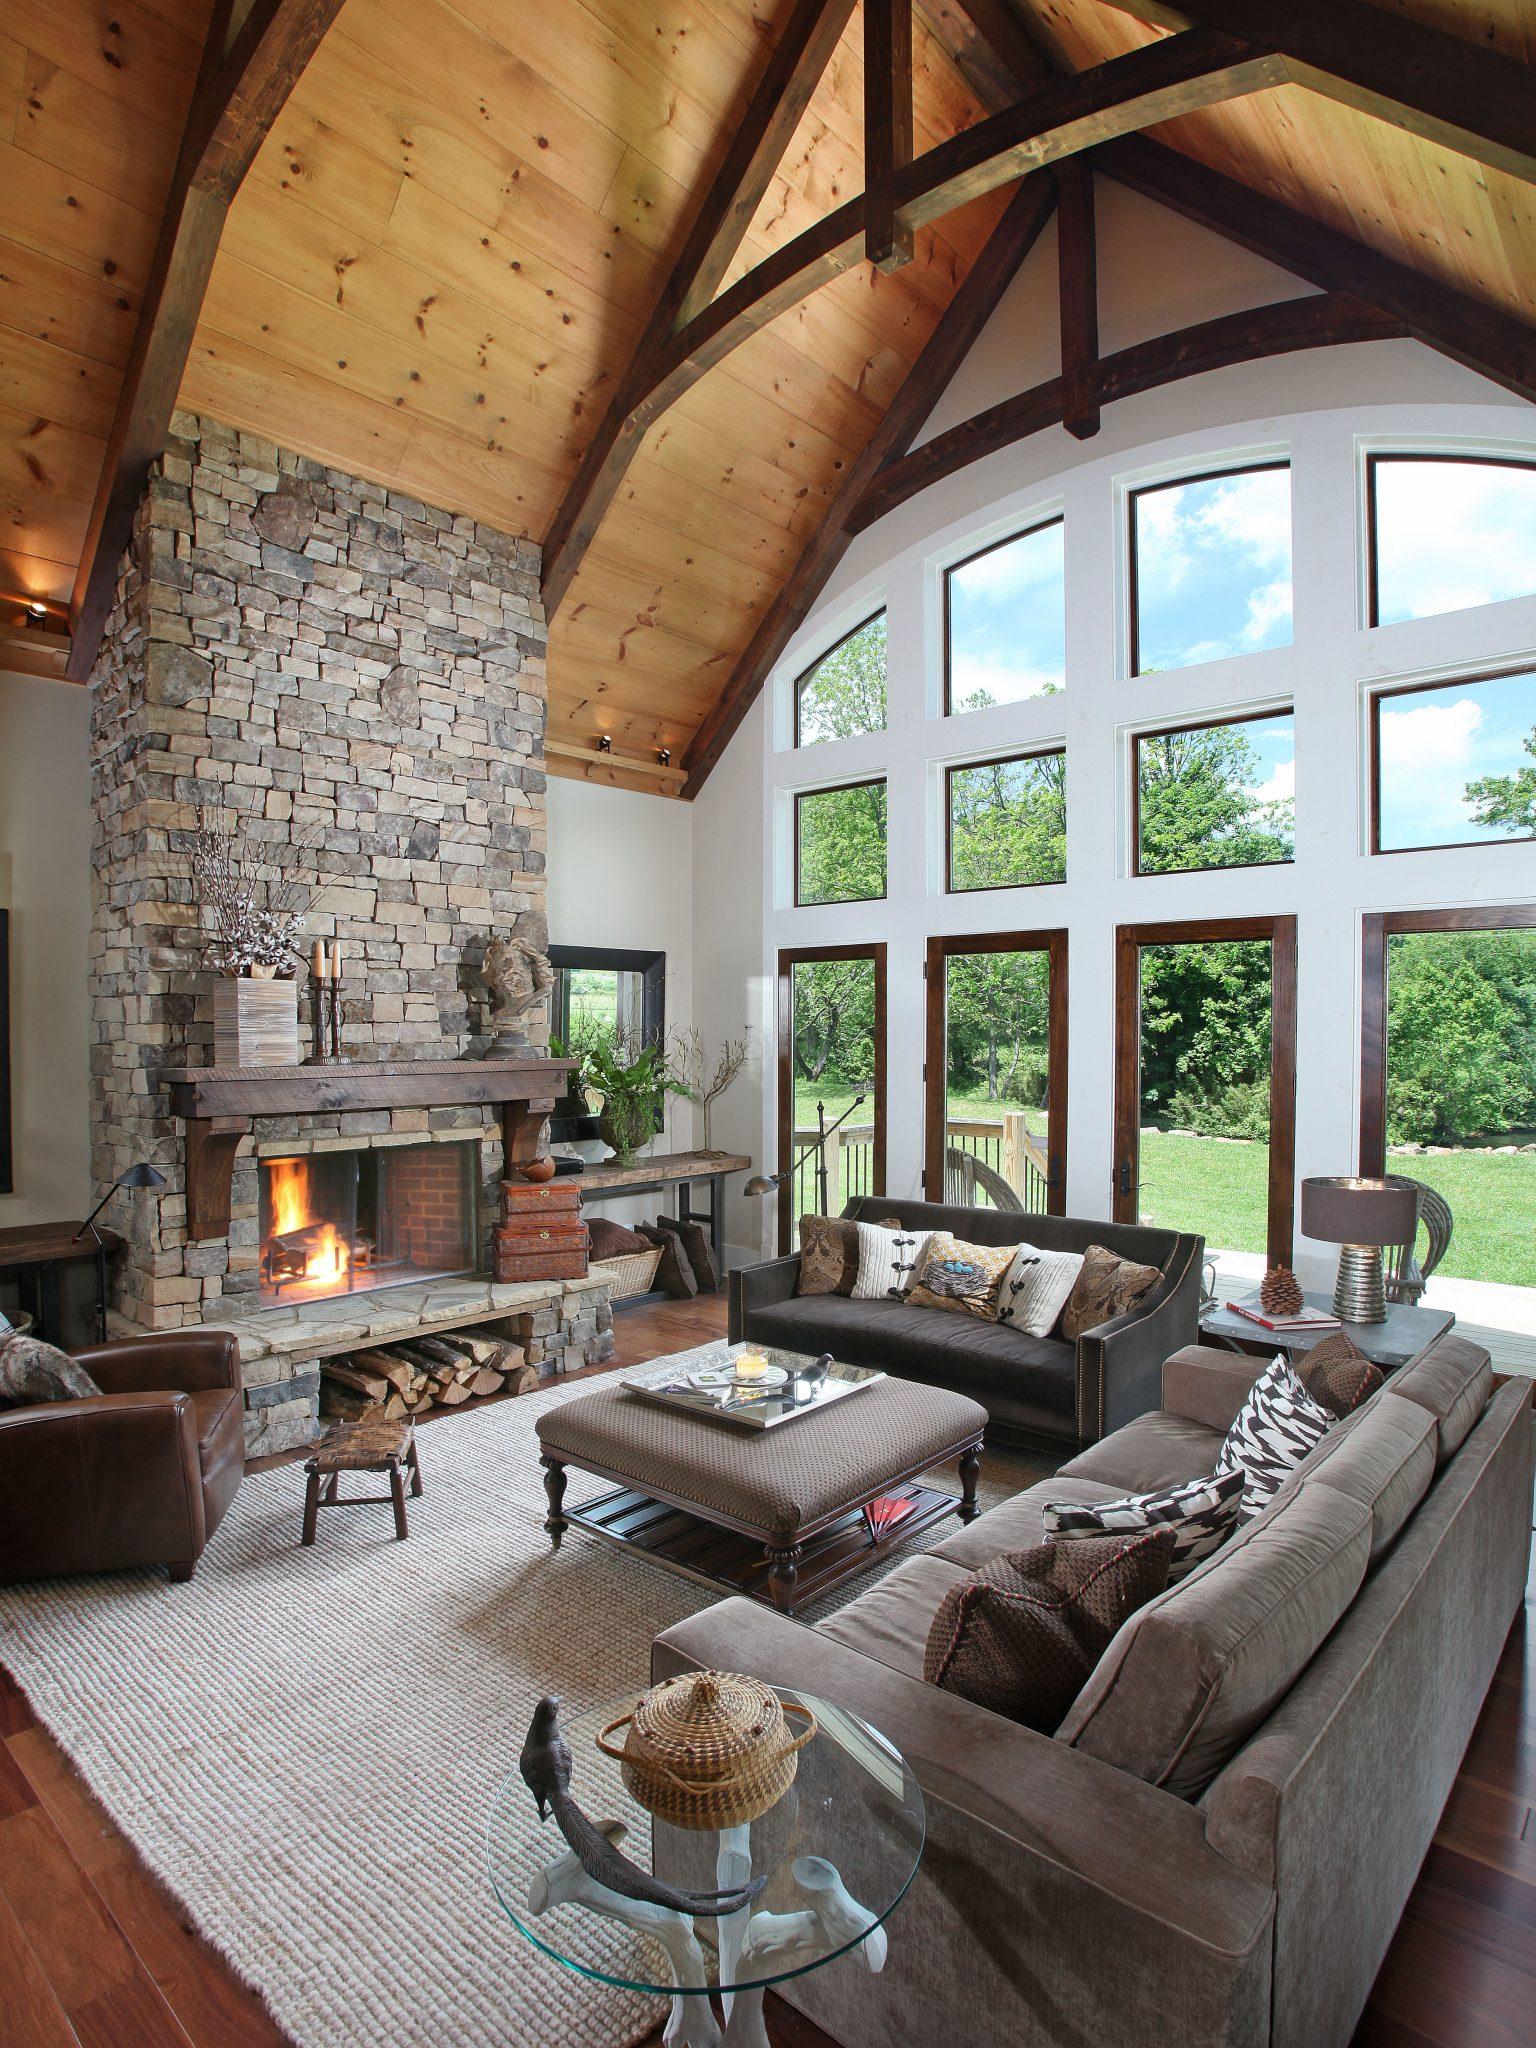 Modern Rustic Home Interior Design ~ Instahomedesign.us